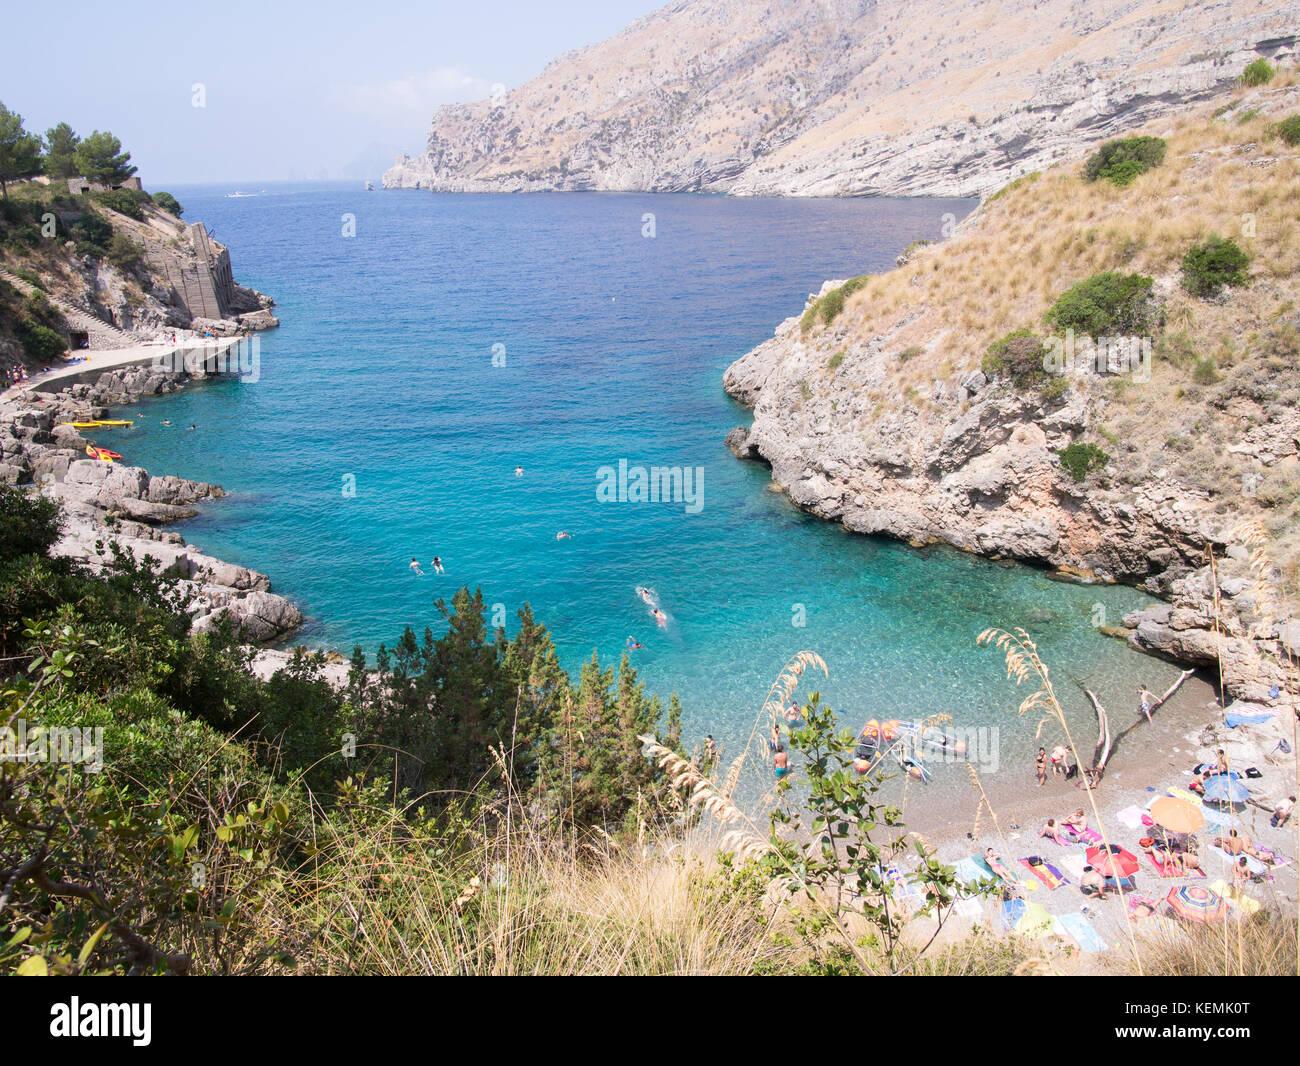 The Bay of Ieranto on the Amalfi Coast Stock Photo